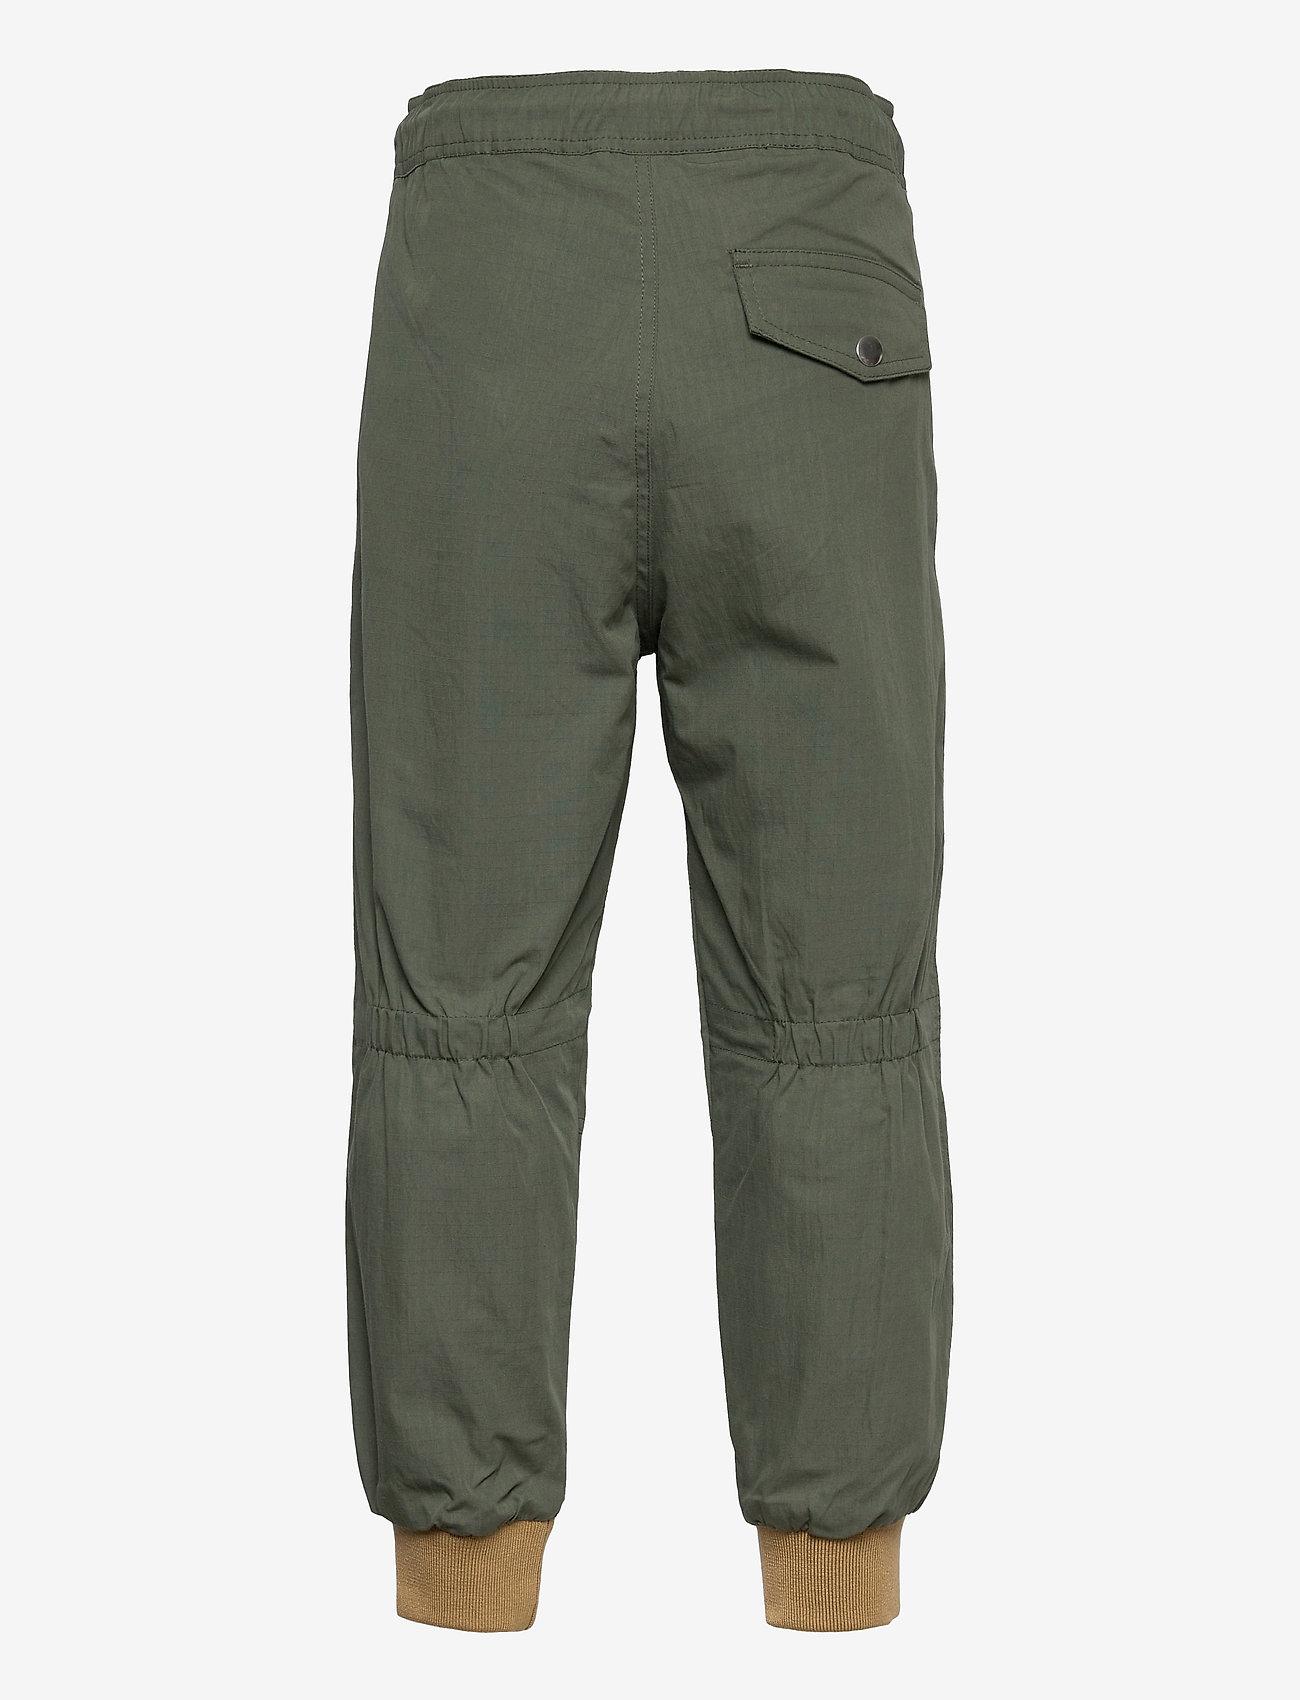 Diesel - PLEVOKI TROUSERS - trousers - olive night - 1